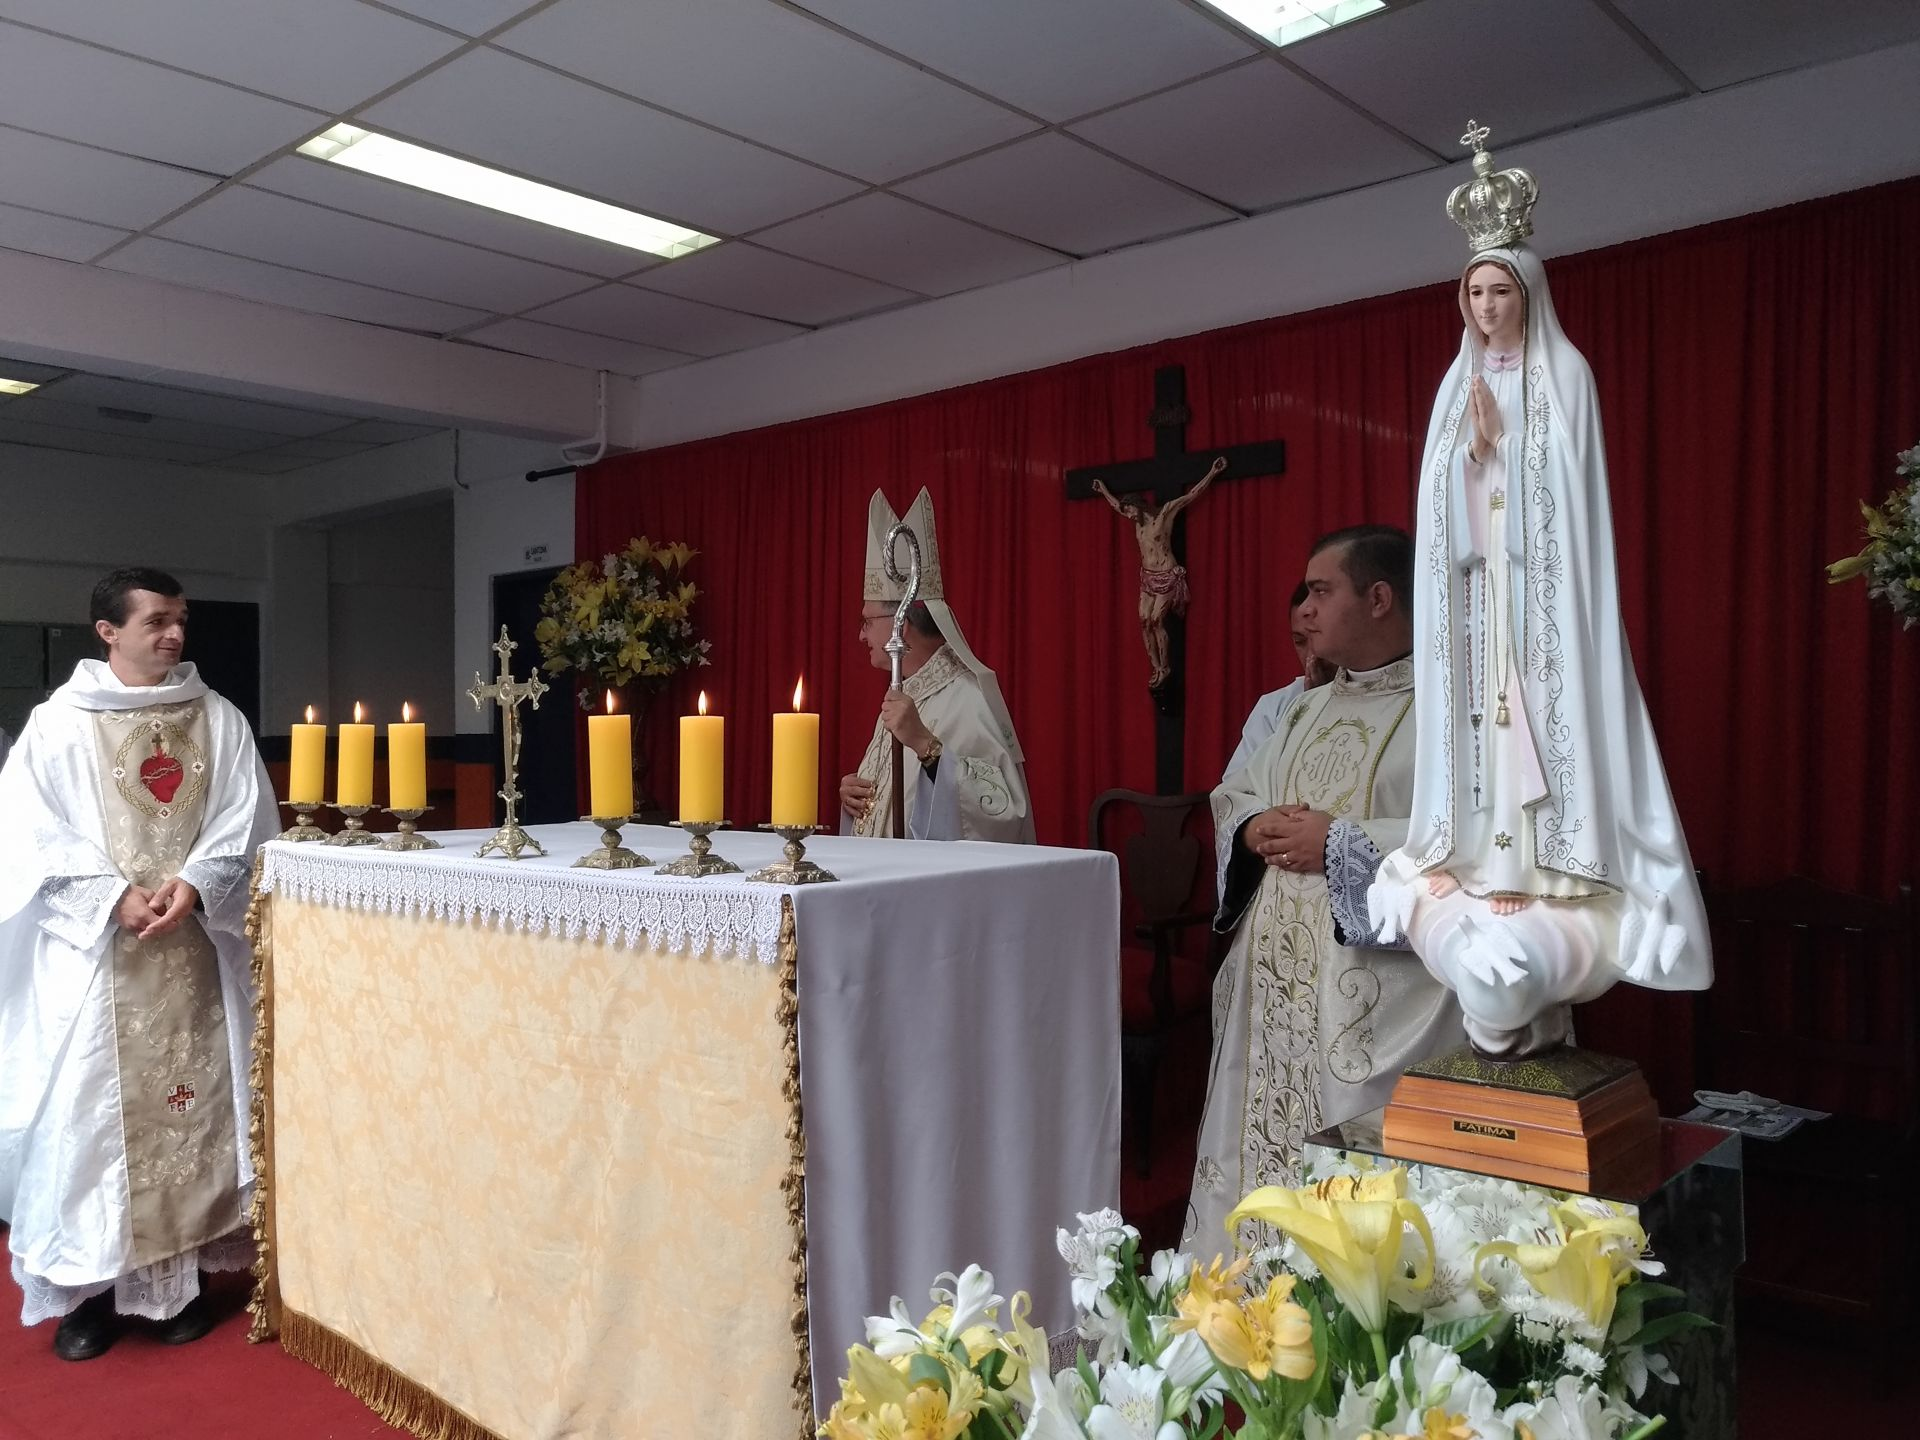 Abertura do ano letivo 2019 - Missa da manhã